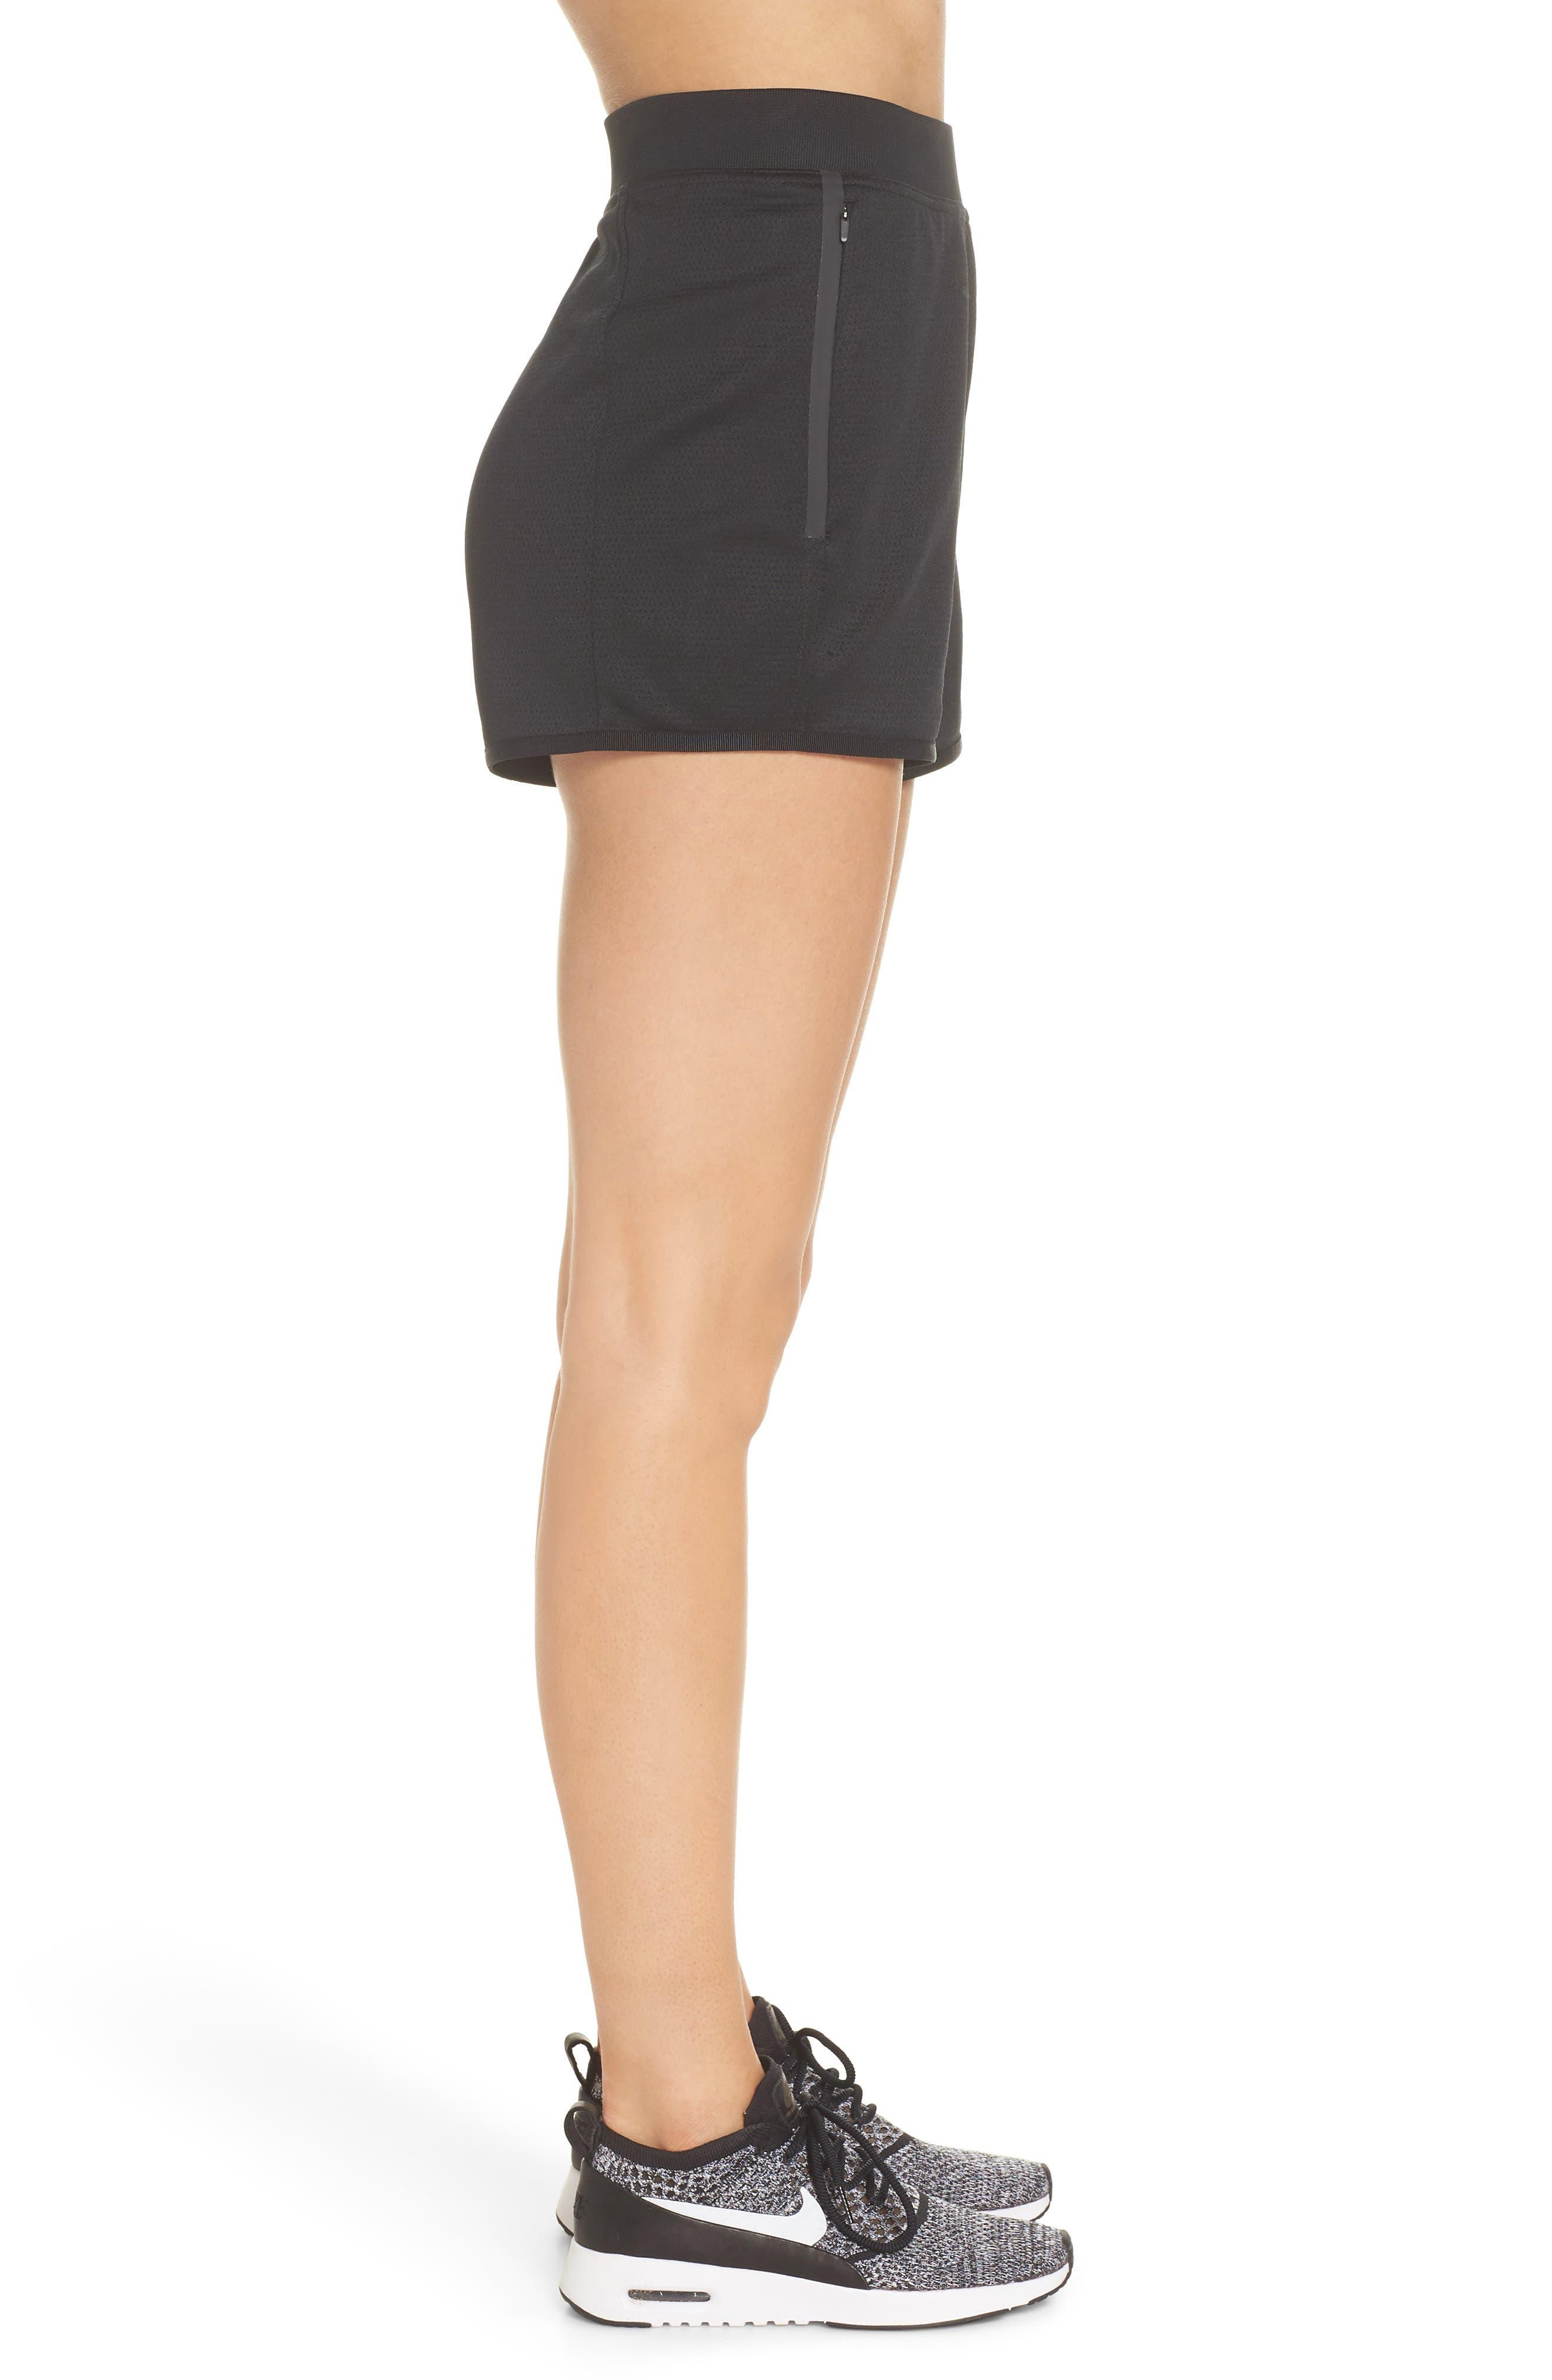 Sportswear Tech Fleece Short,                             Alternate thumbnail 3, color,                             010